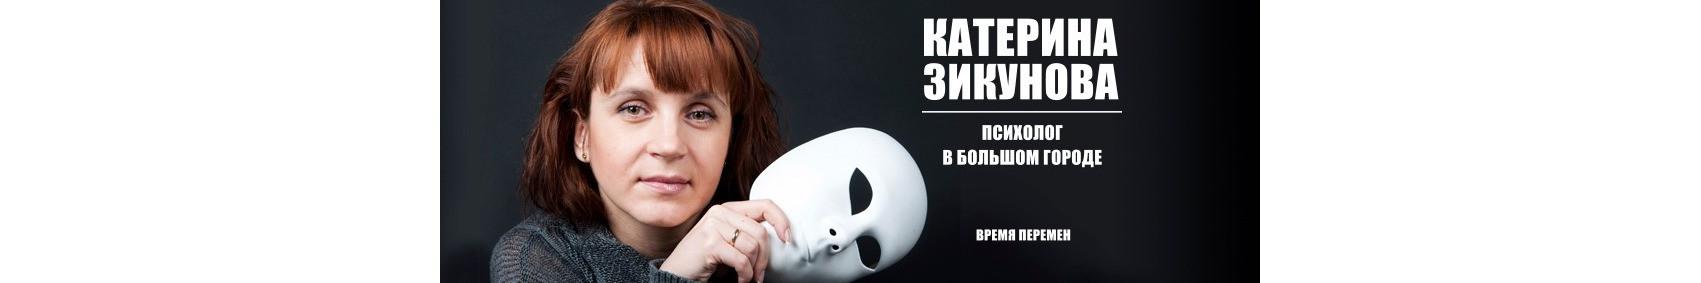 Психолог Катерина Зикунова